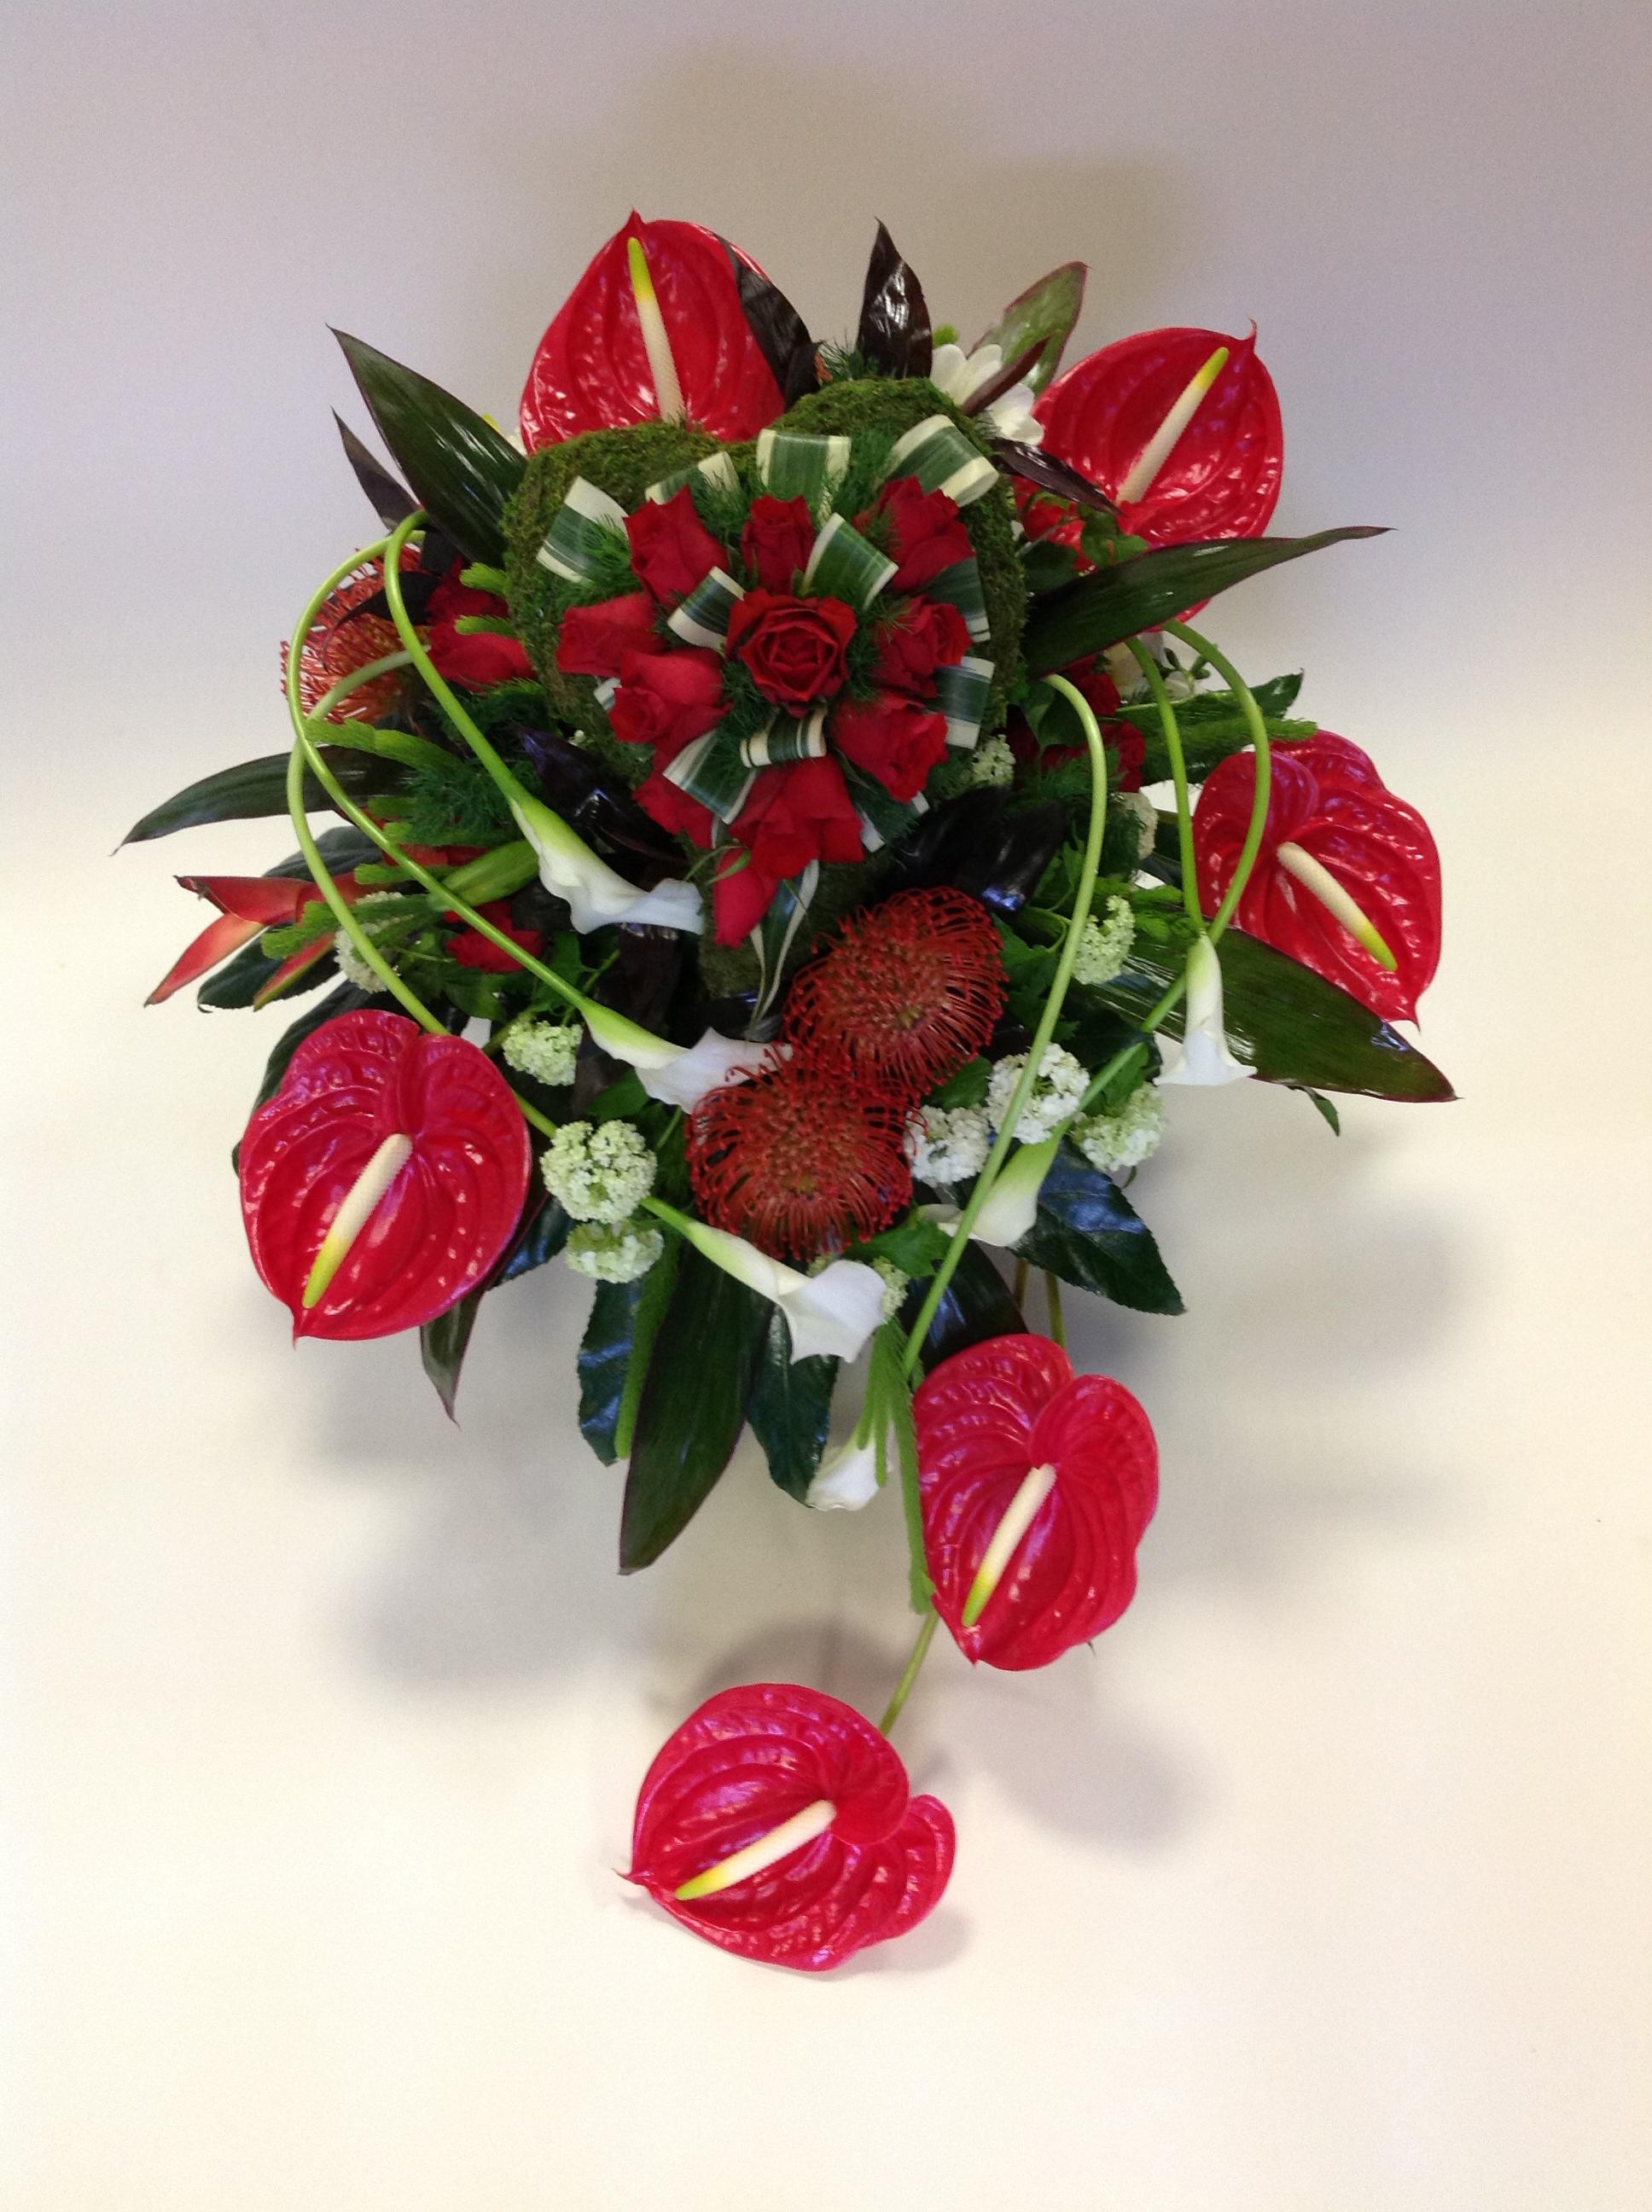 25 30 Helloworld Cx: JK Floral Design Halifax